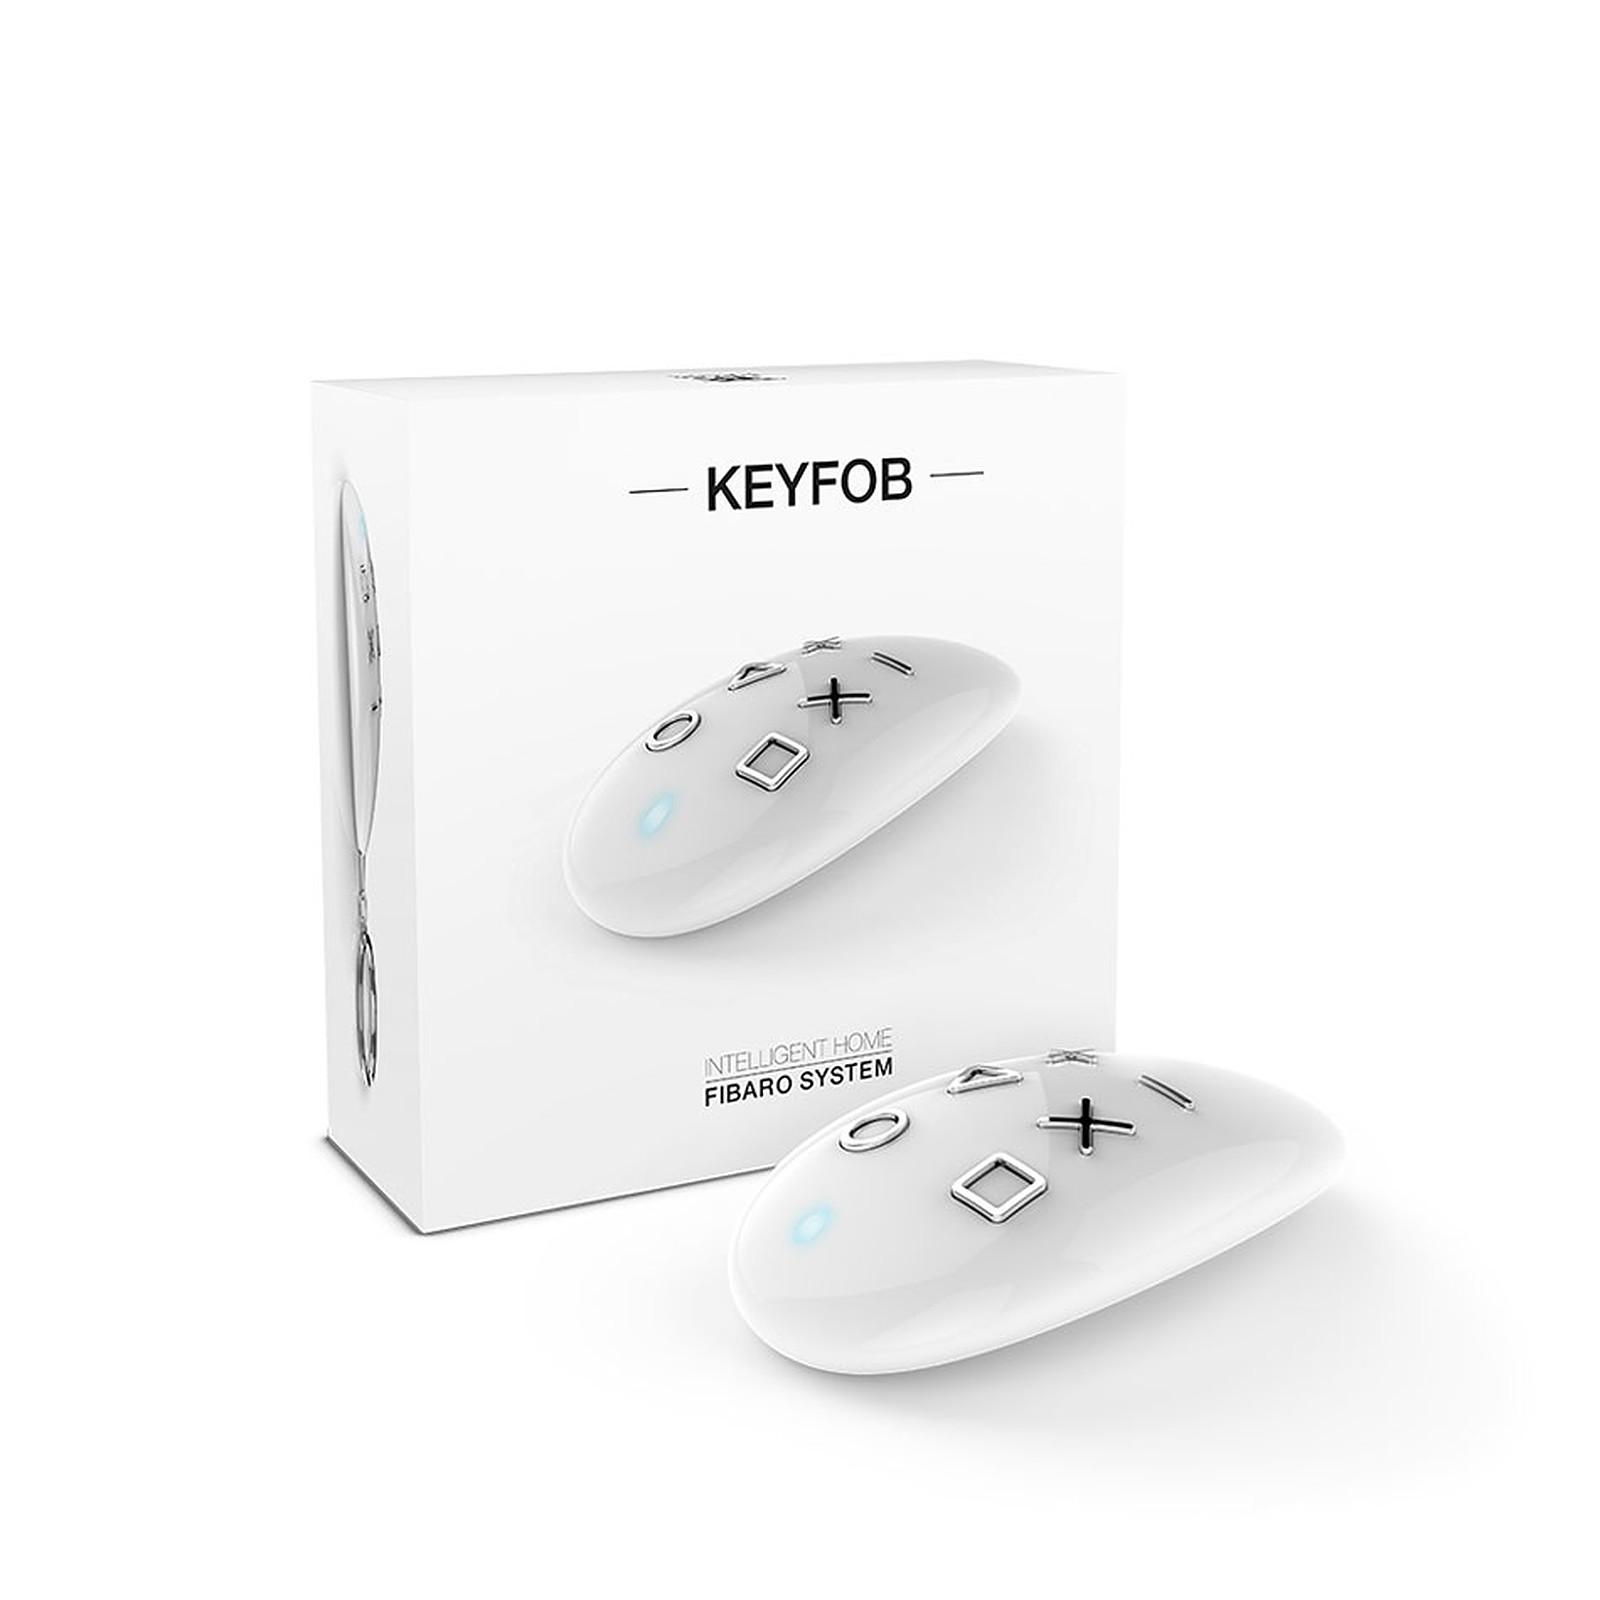 Fibaro Keyfob (FGKF-601)